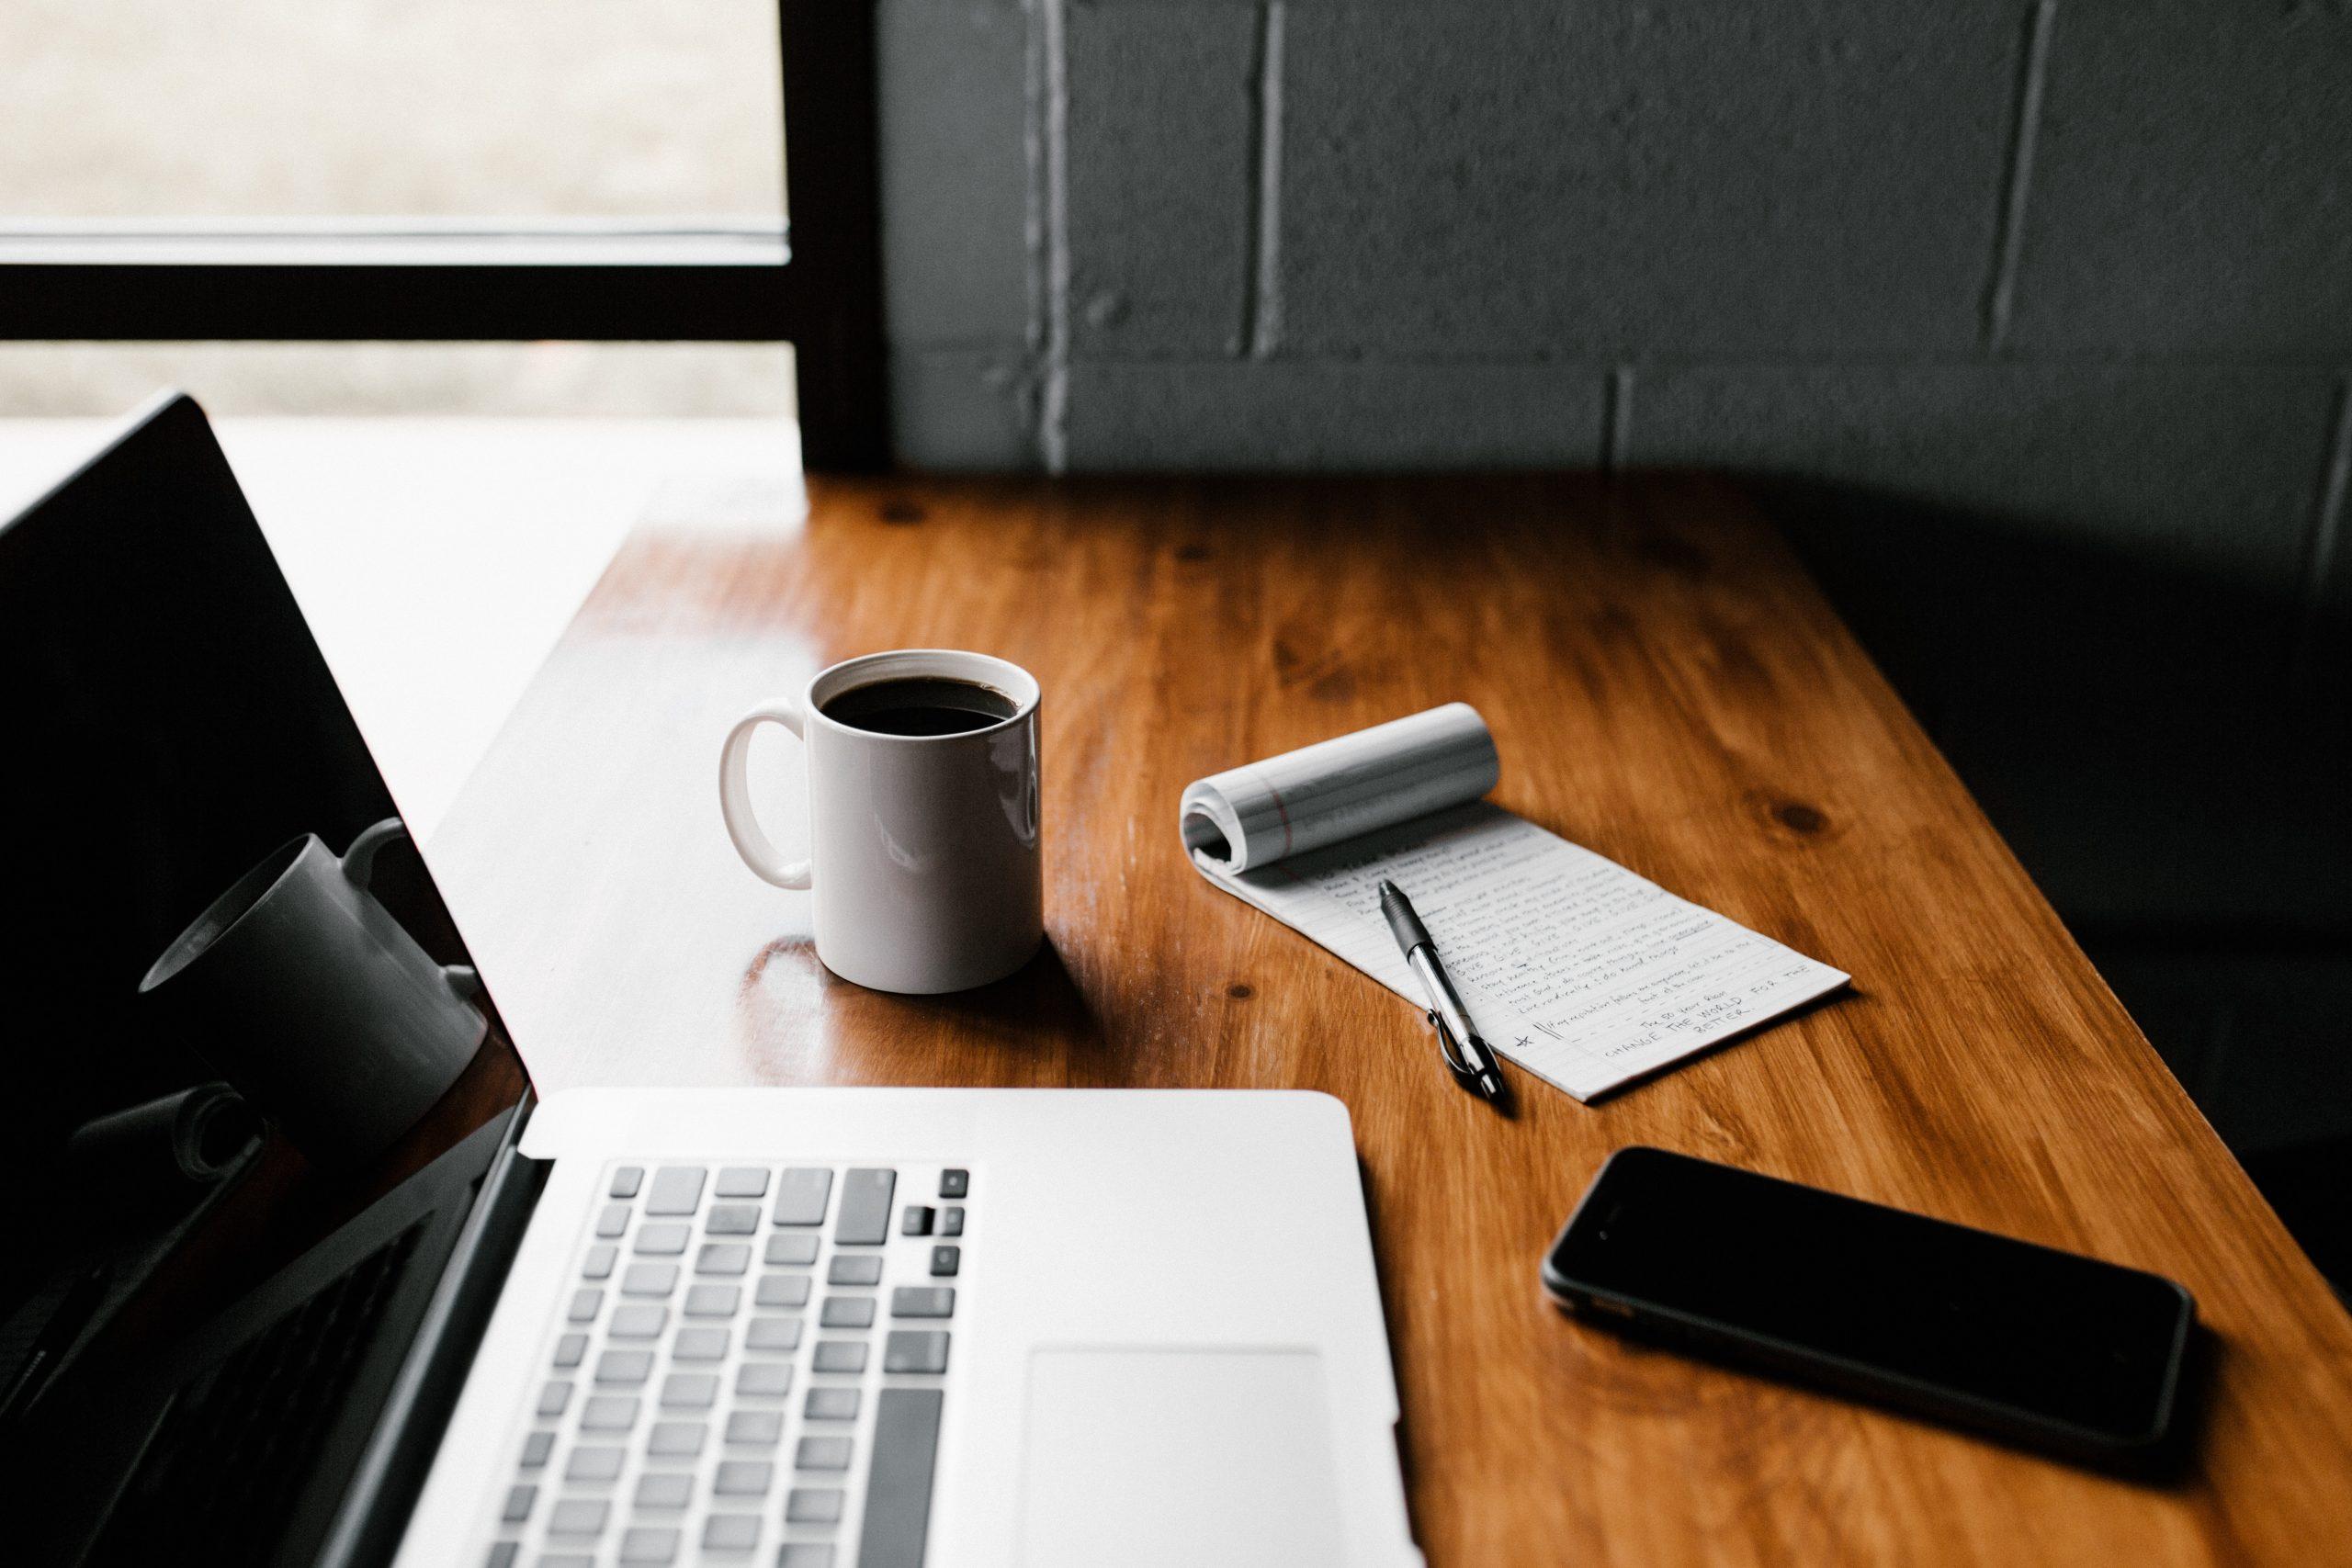 Notebook sobre a mesa ao lado de bloco de notas, caneta, celular e xícara de café